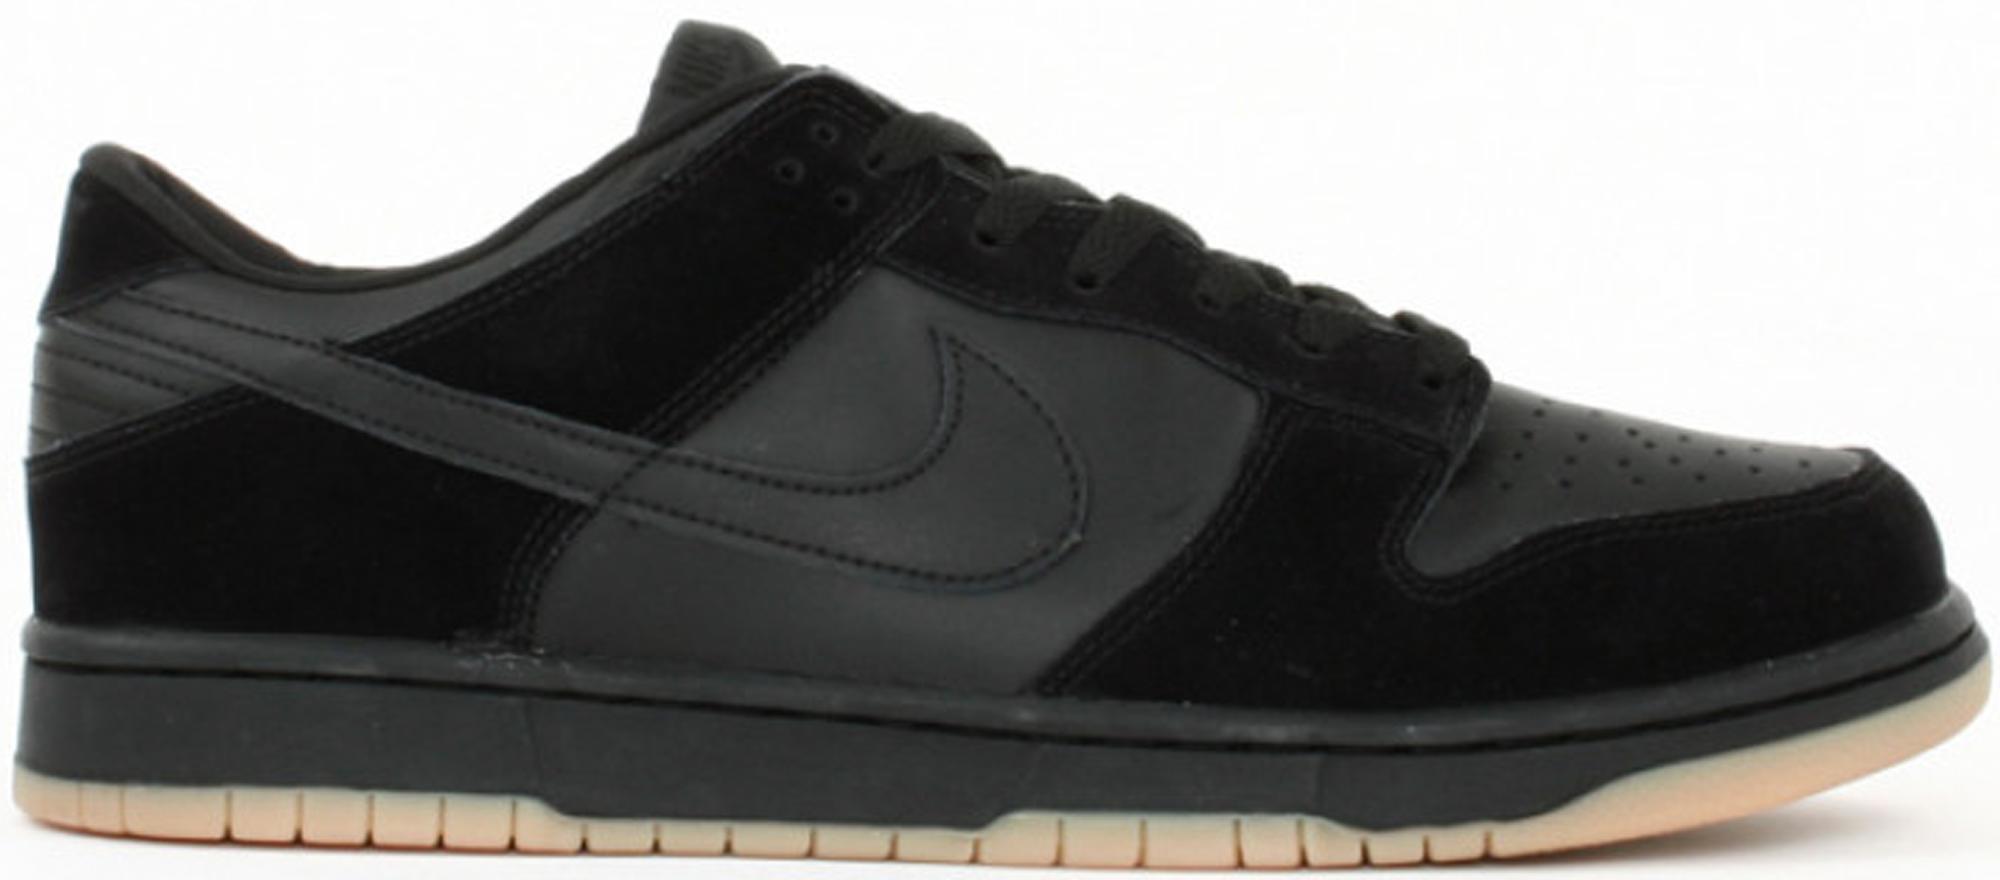 Nike Dunk Low Black Gum (2003) - 304714-002